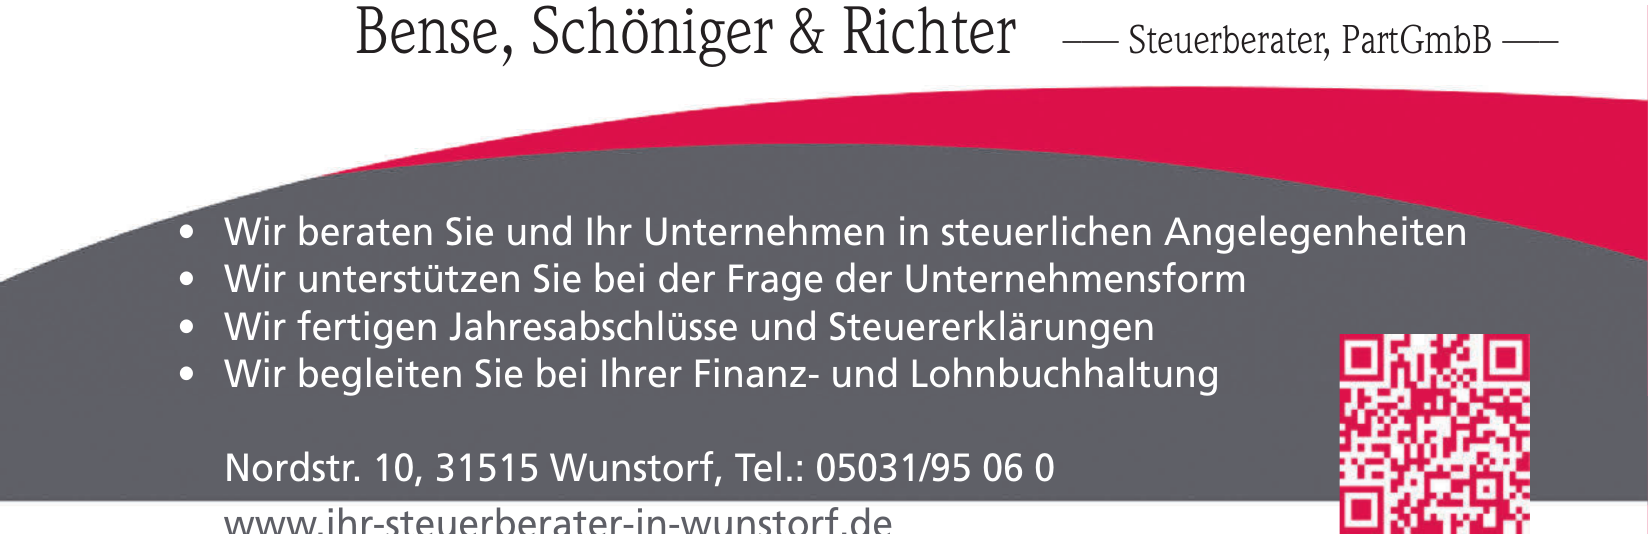 Bense, Schöniger & Richter